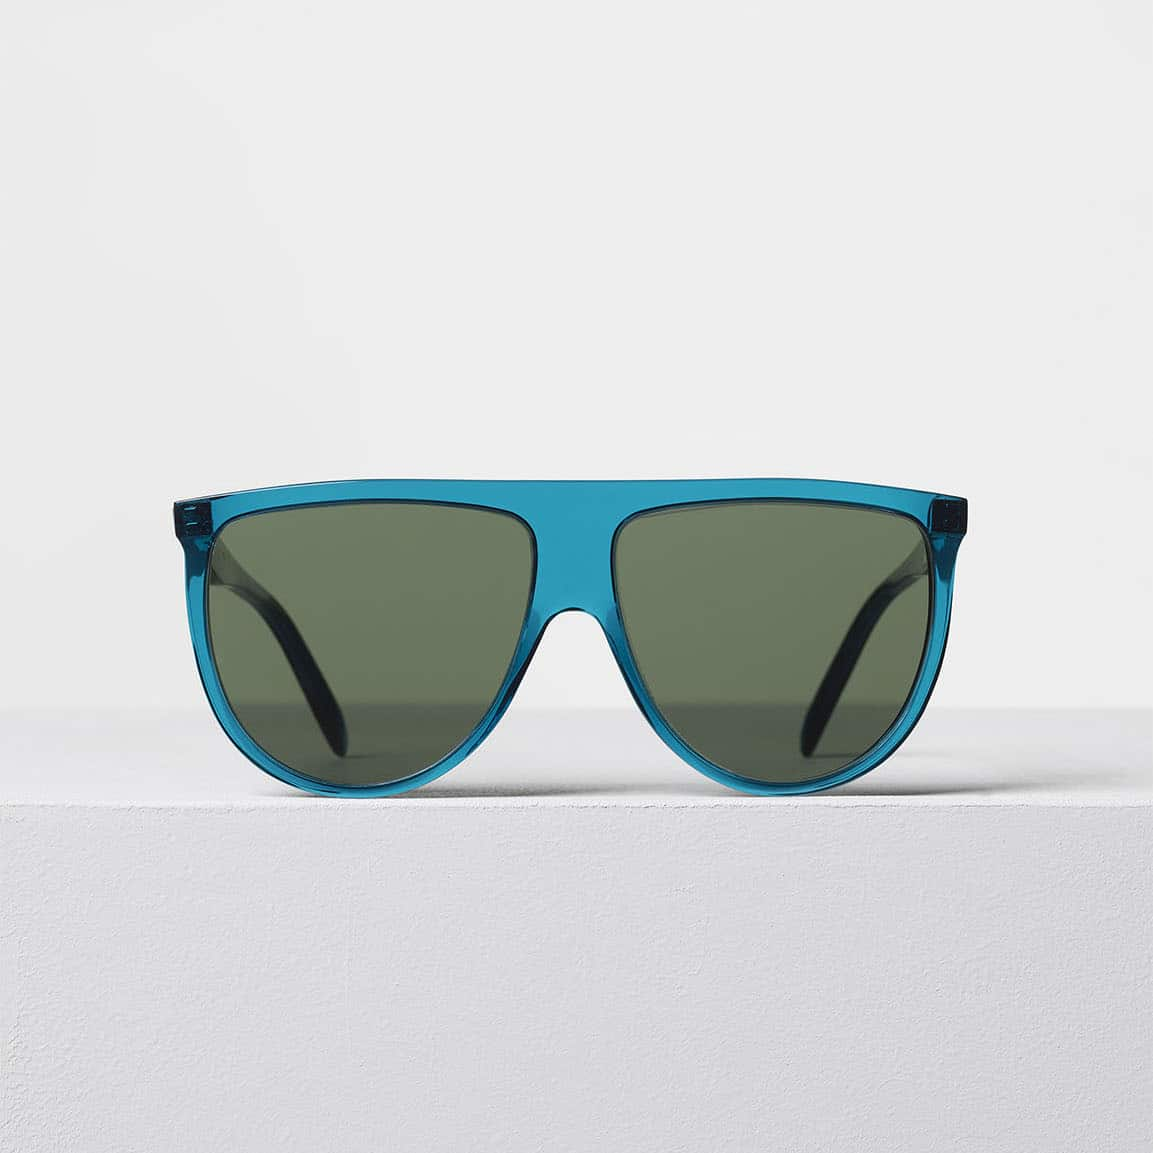 58e79288c908 Celine Thin Shadow Sunglasses